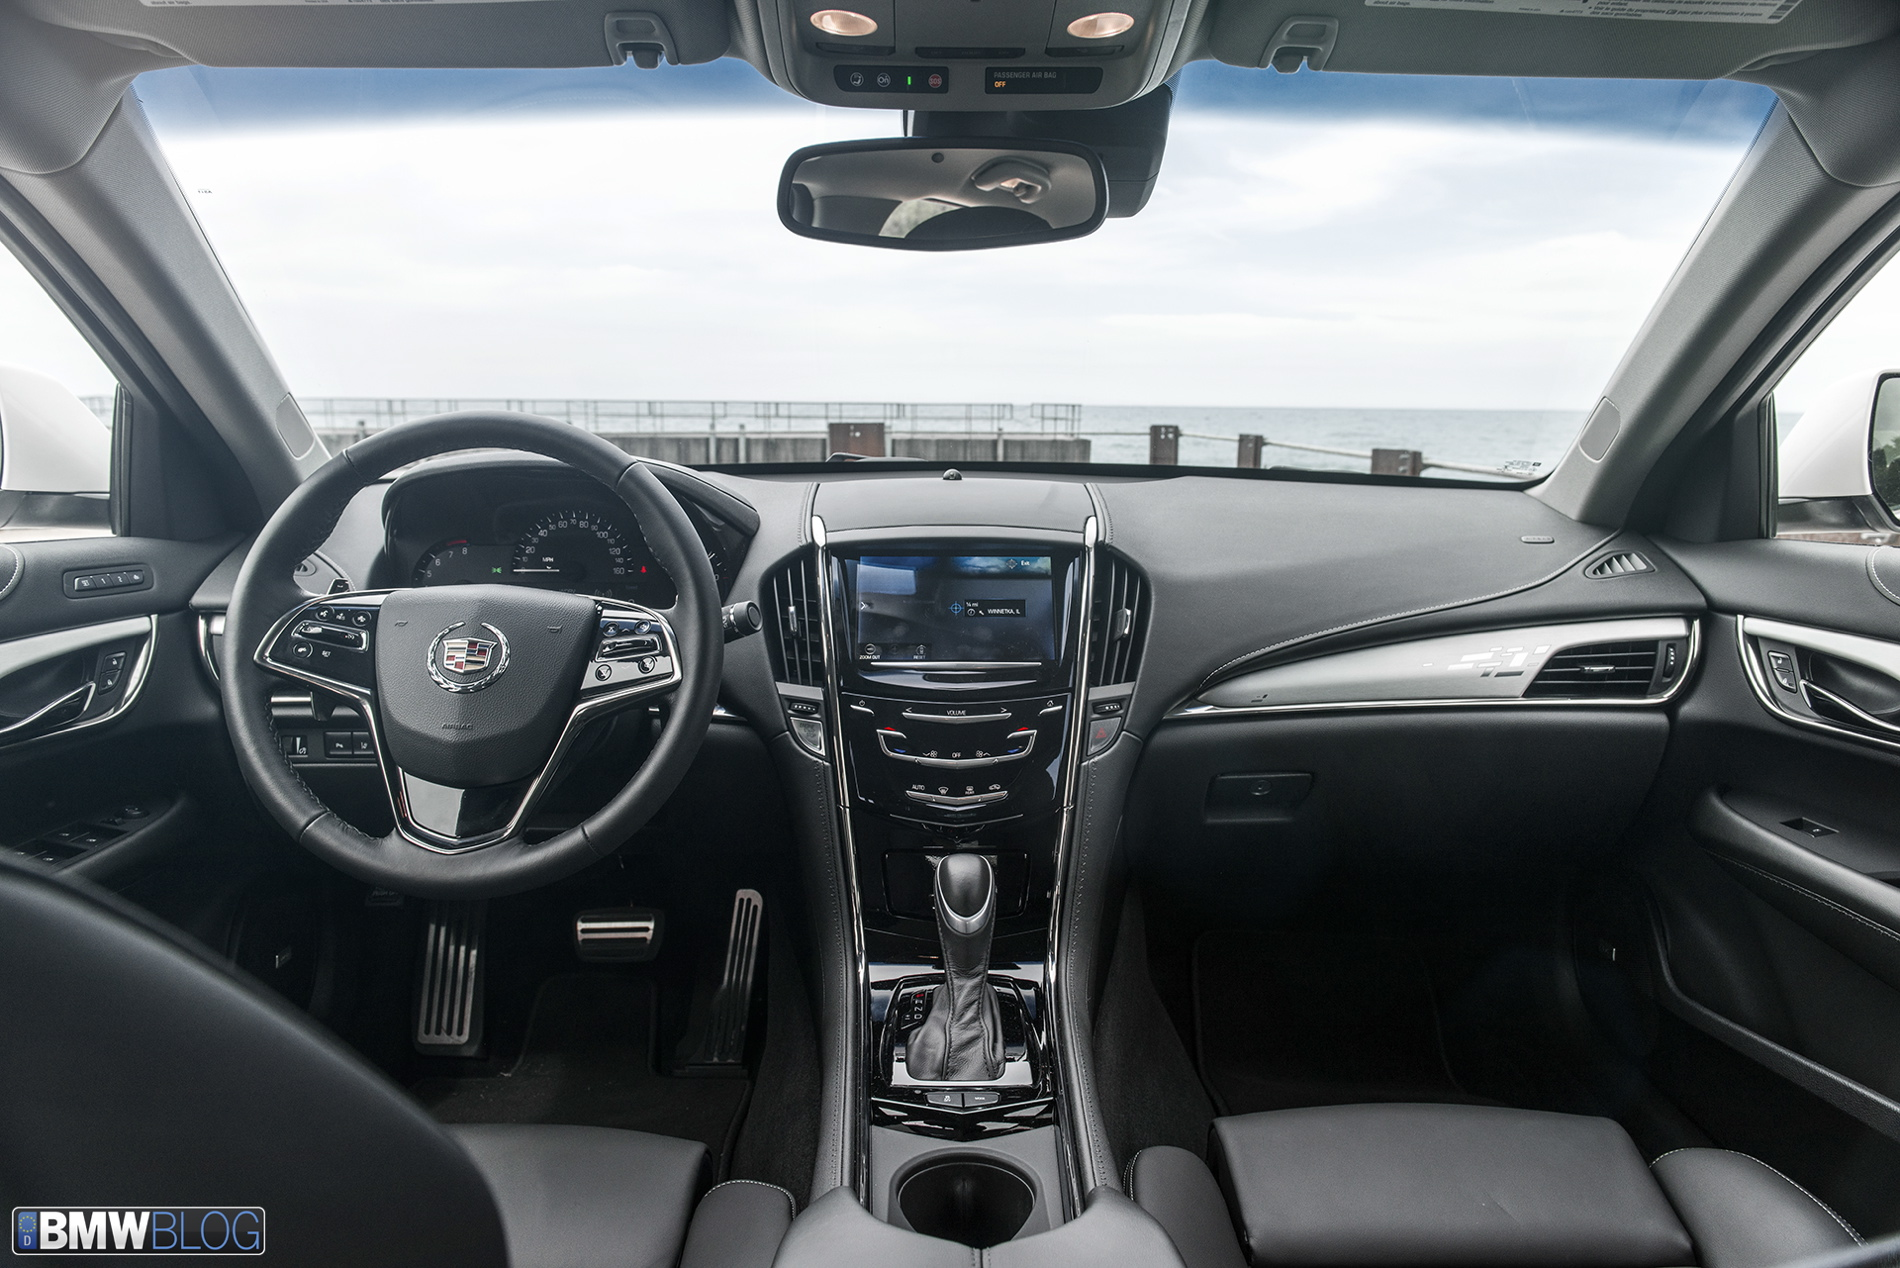 Bmwblog Test Drive 2013 Cadillac Ats 2 0t